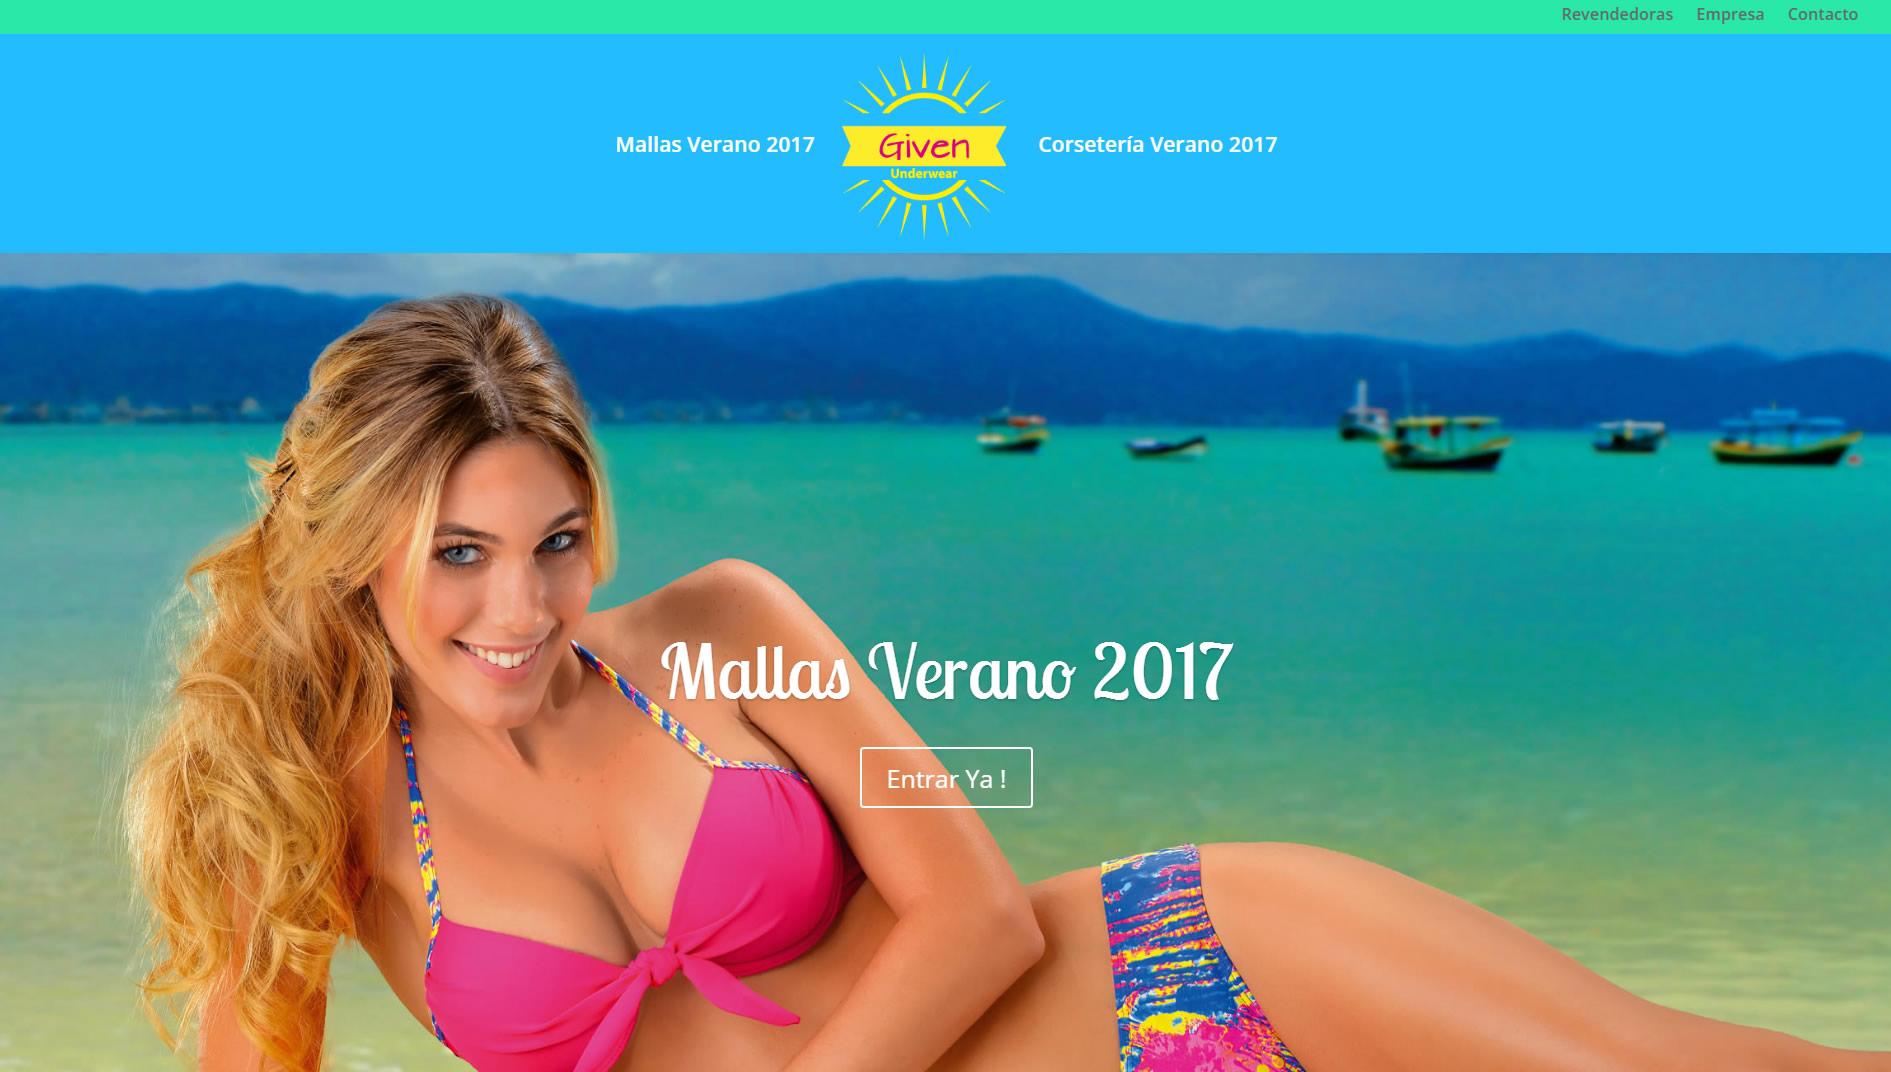 Lenceria Given Verano 2017